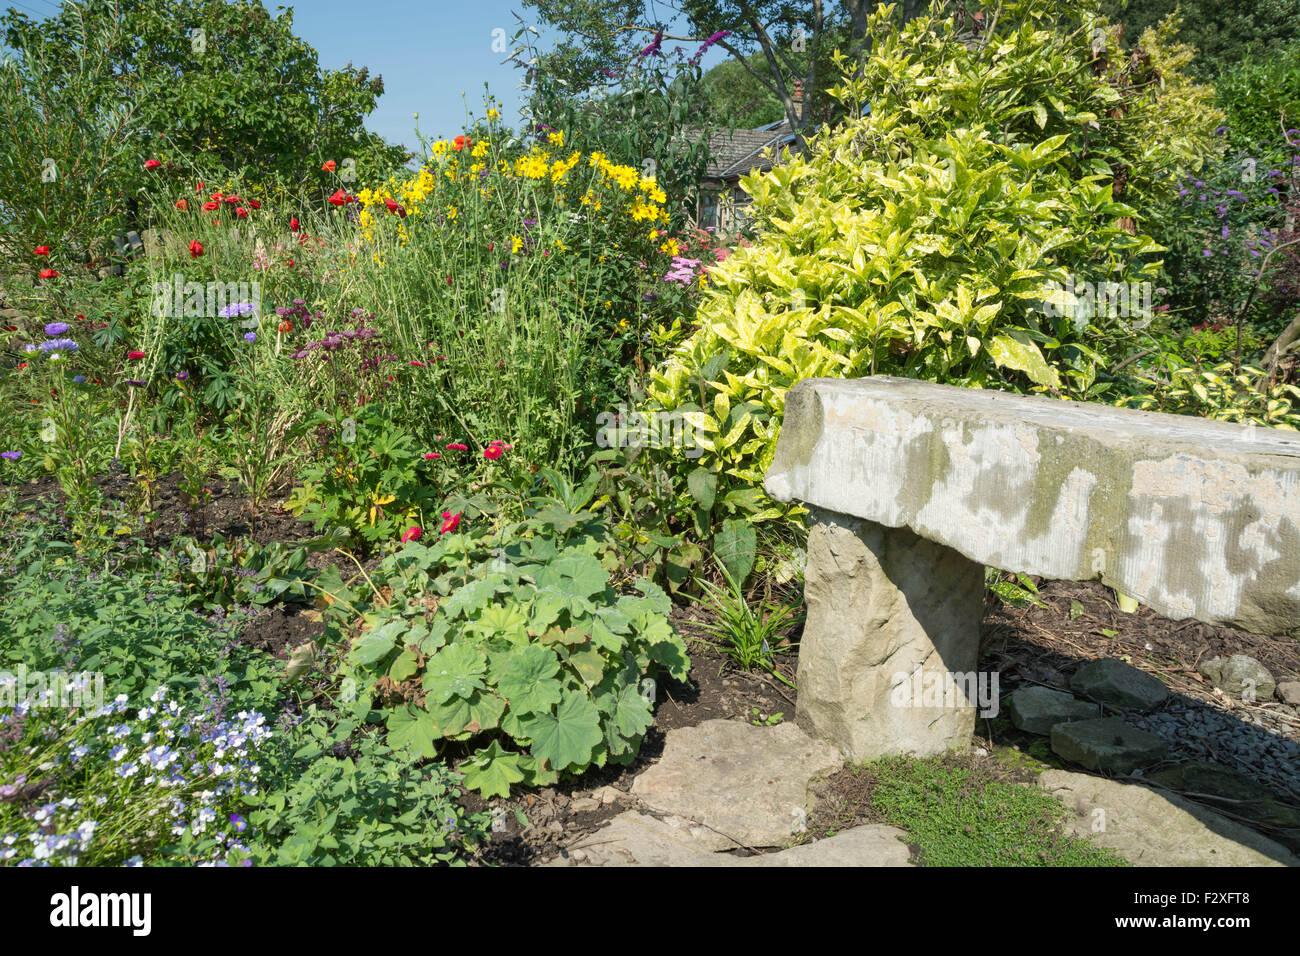 Stone seat and garden border - Stock Image